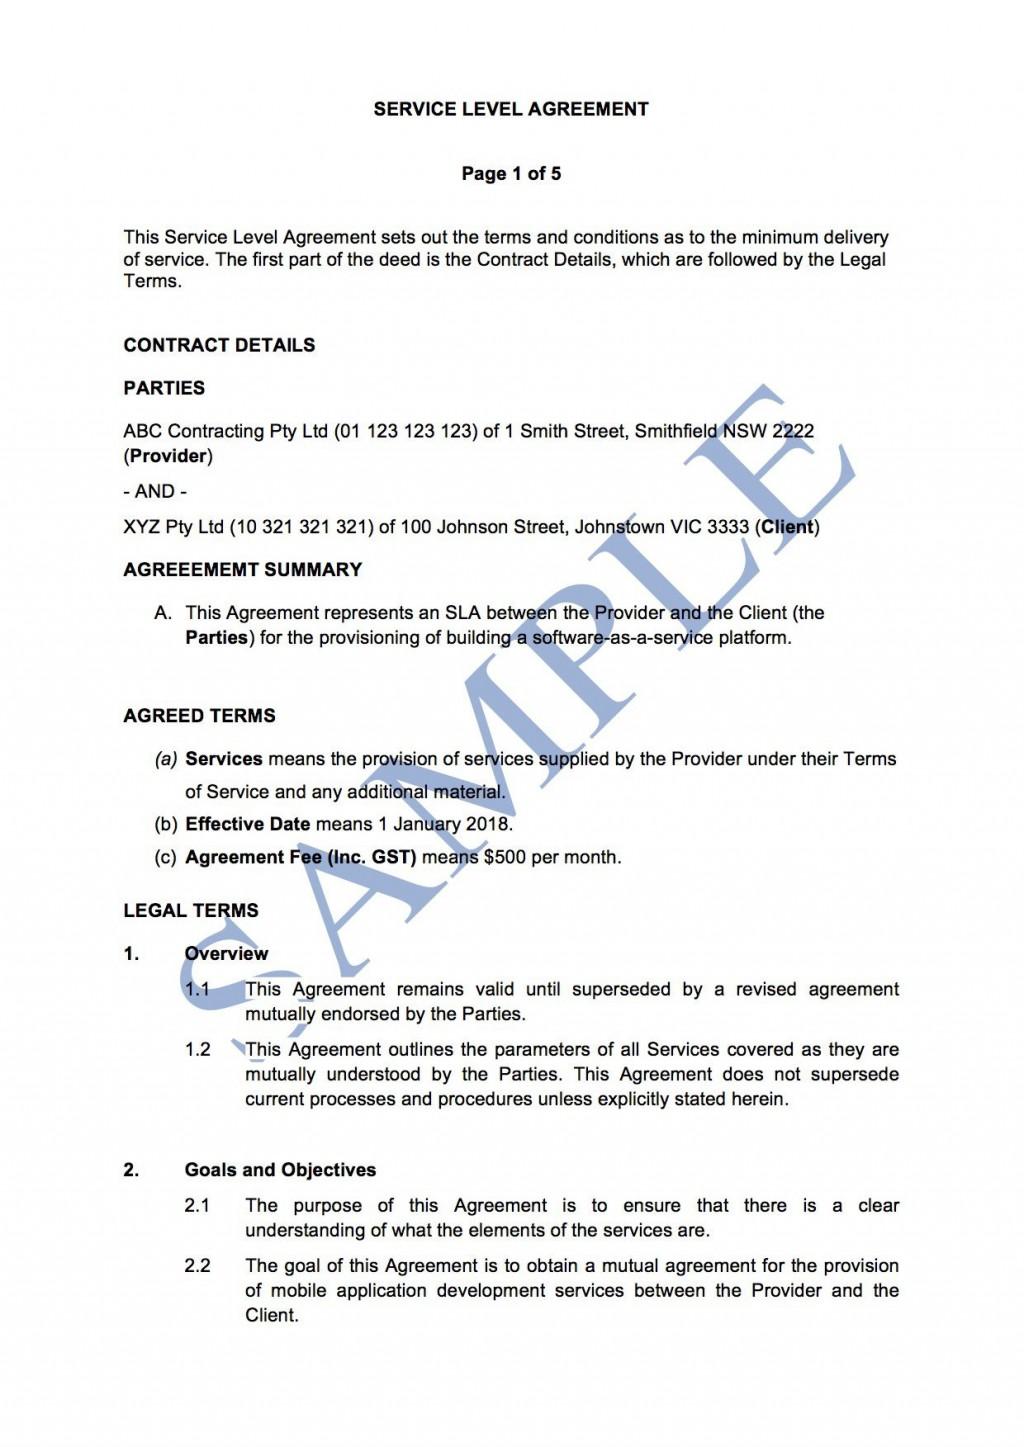 006 Best Service Level Agreement Template Concept  South Africa Nz For Website DevelopmentLarge